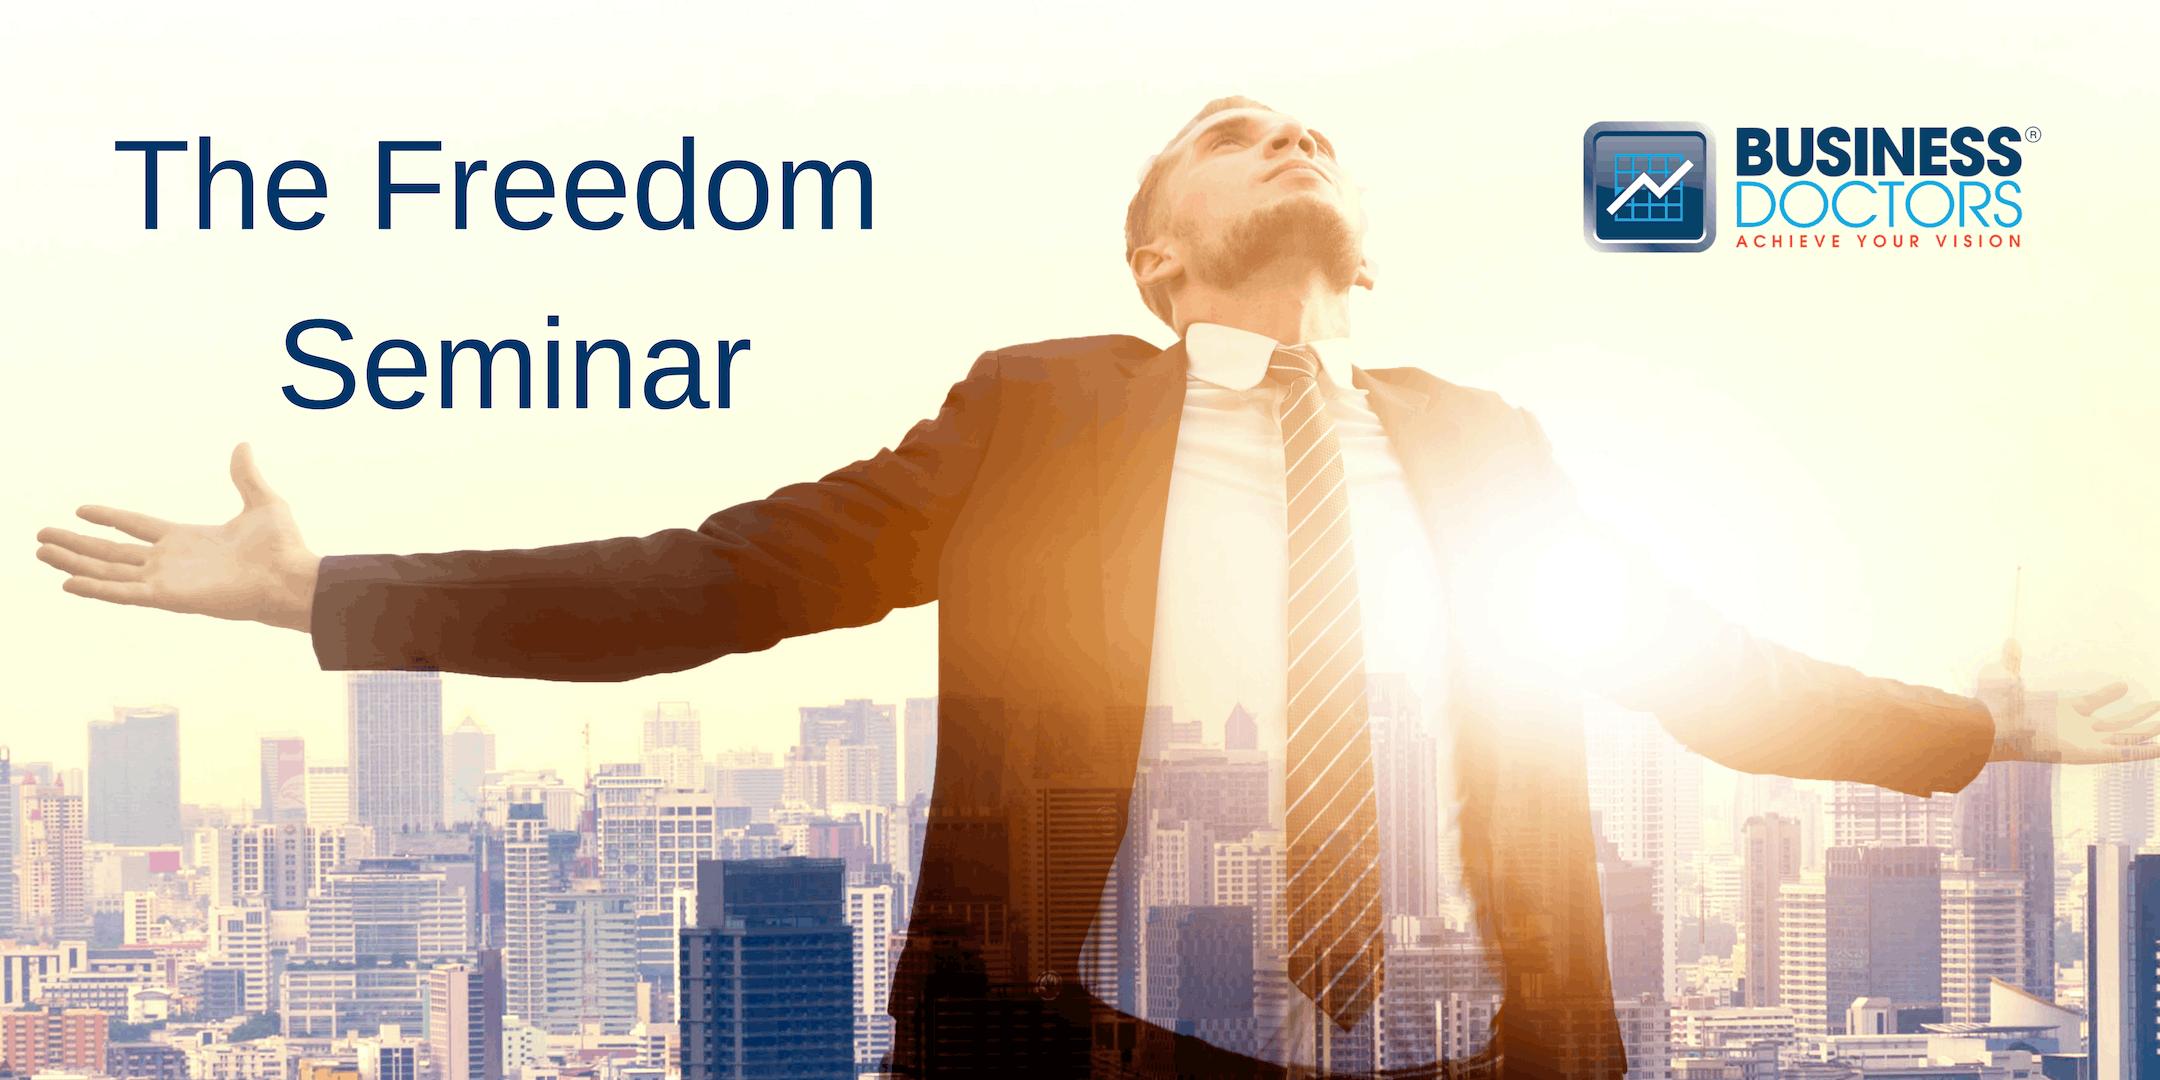 The Freedom Seminar